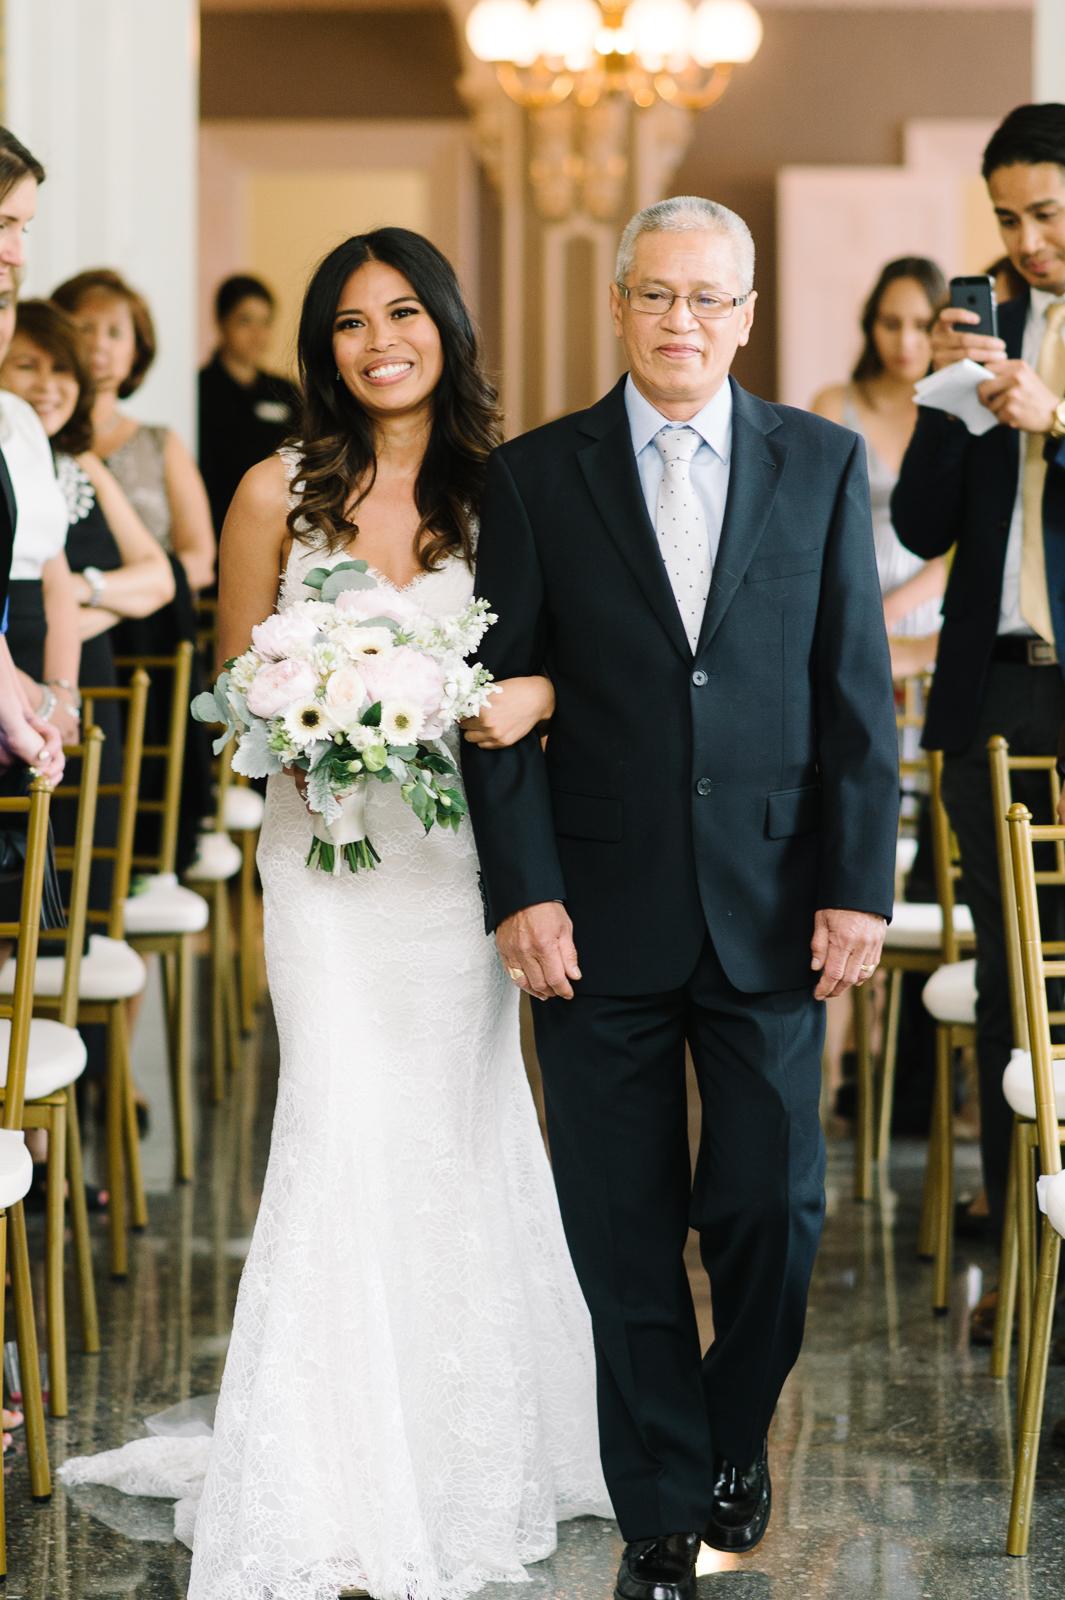 tara-mcmullen-photography-toronto-wedding-photography-alderlea-mansion-wedding-alderlea-wedding-brampton-scotsdale-farm-wedding-reem-acra-wedding-018